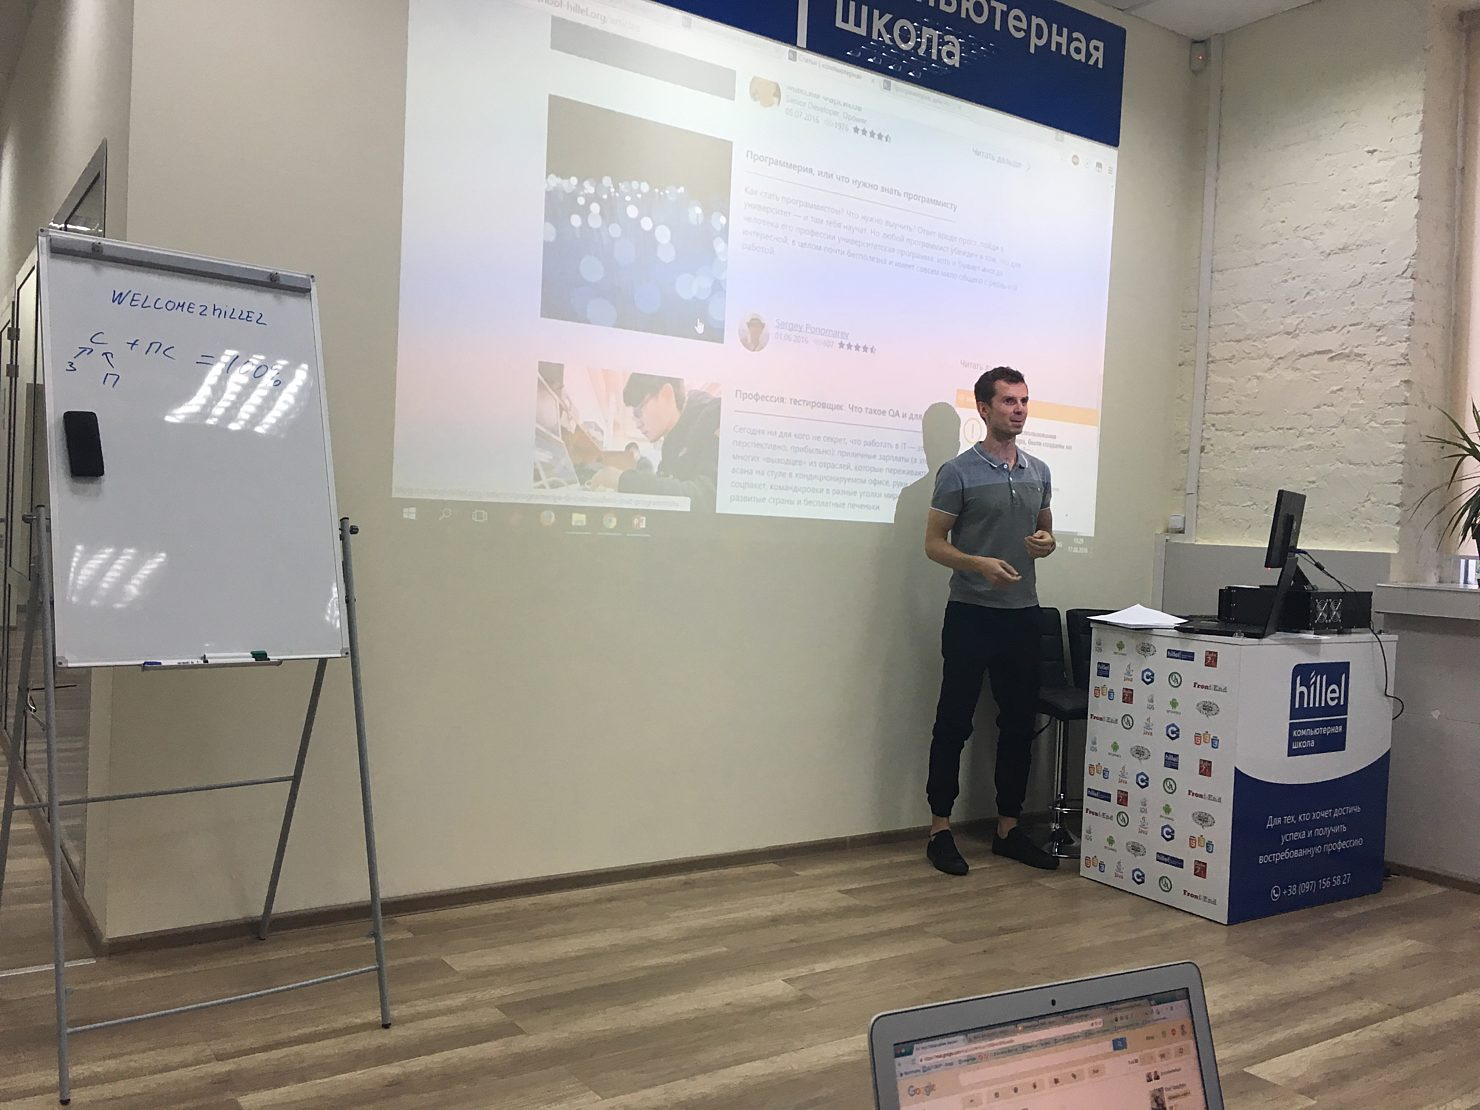 Новости школы: Презентация курса «Интернет-маркетинг».